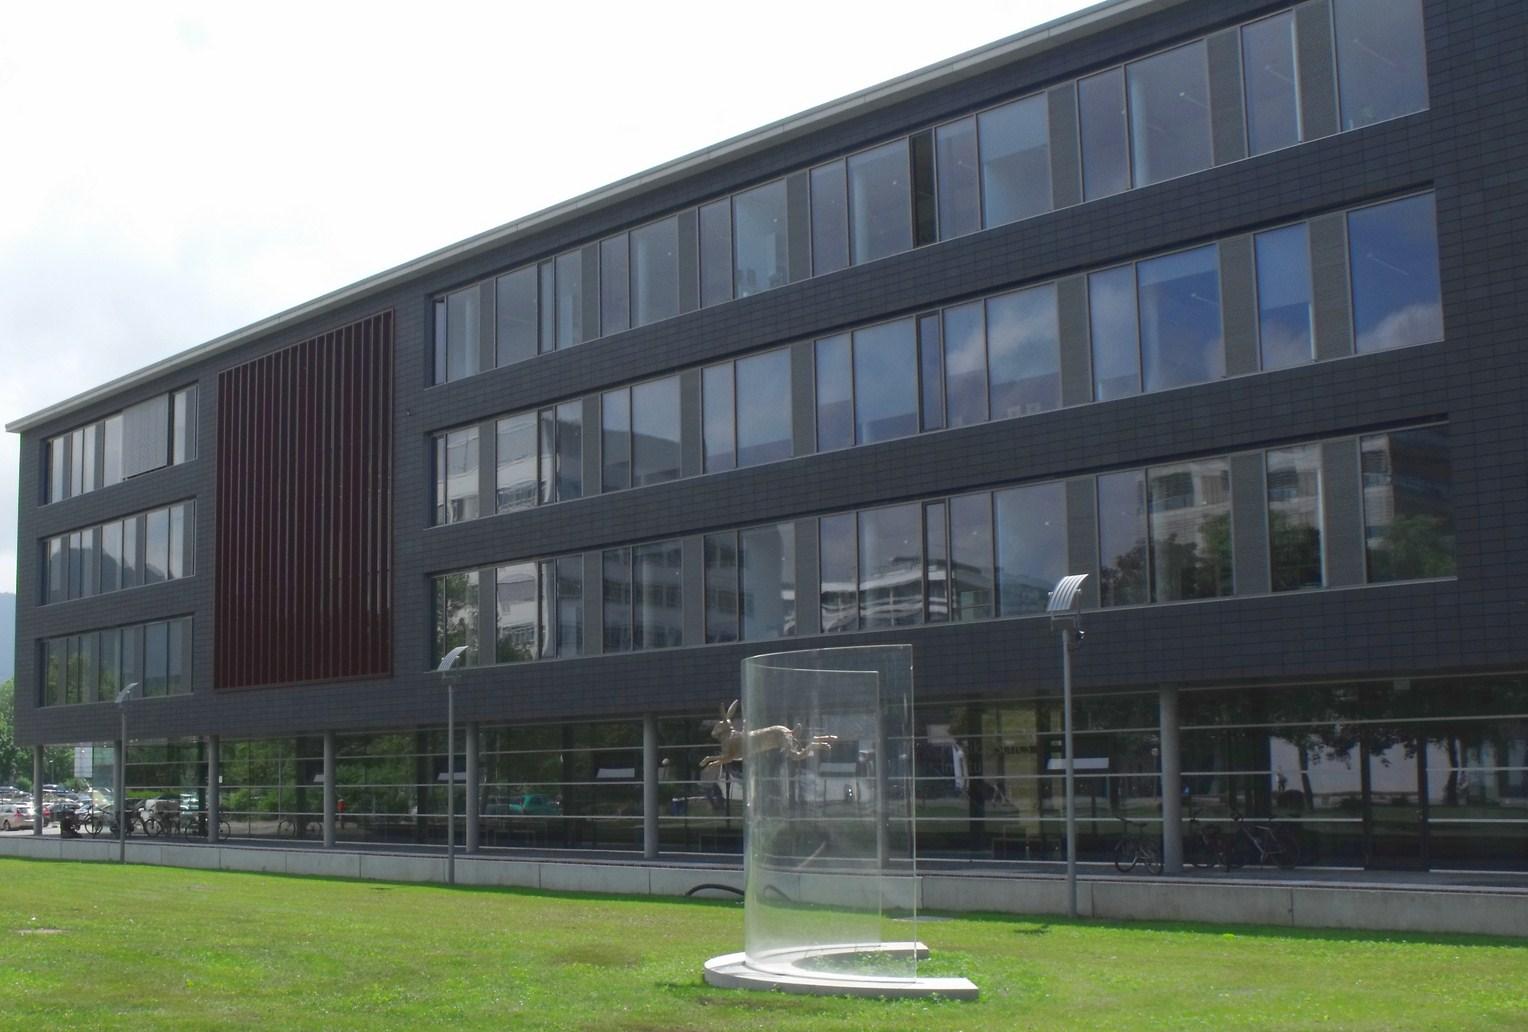 physikalisches institut heidelberg. Black Bedroom Furniture Sets. Home Design Ideas